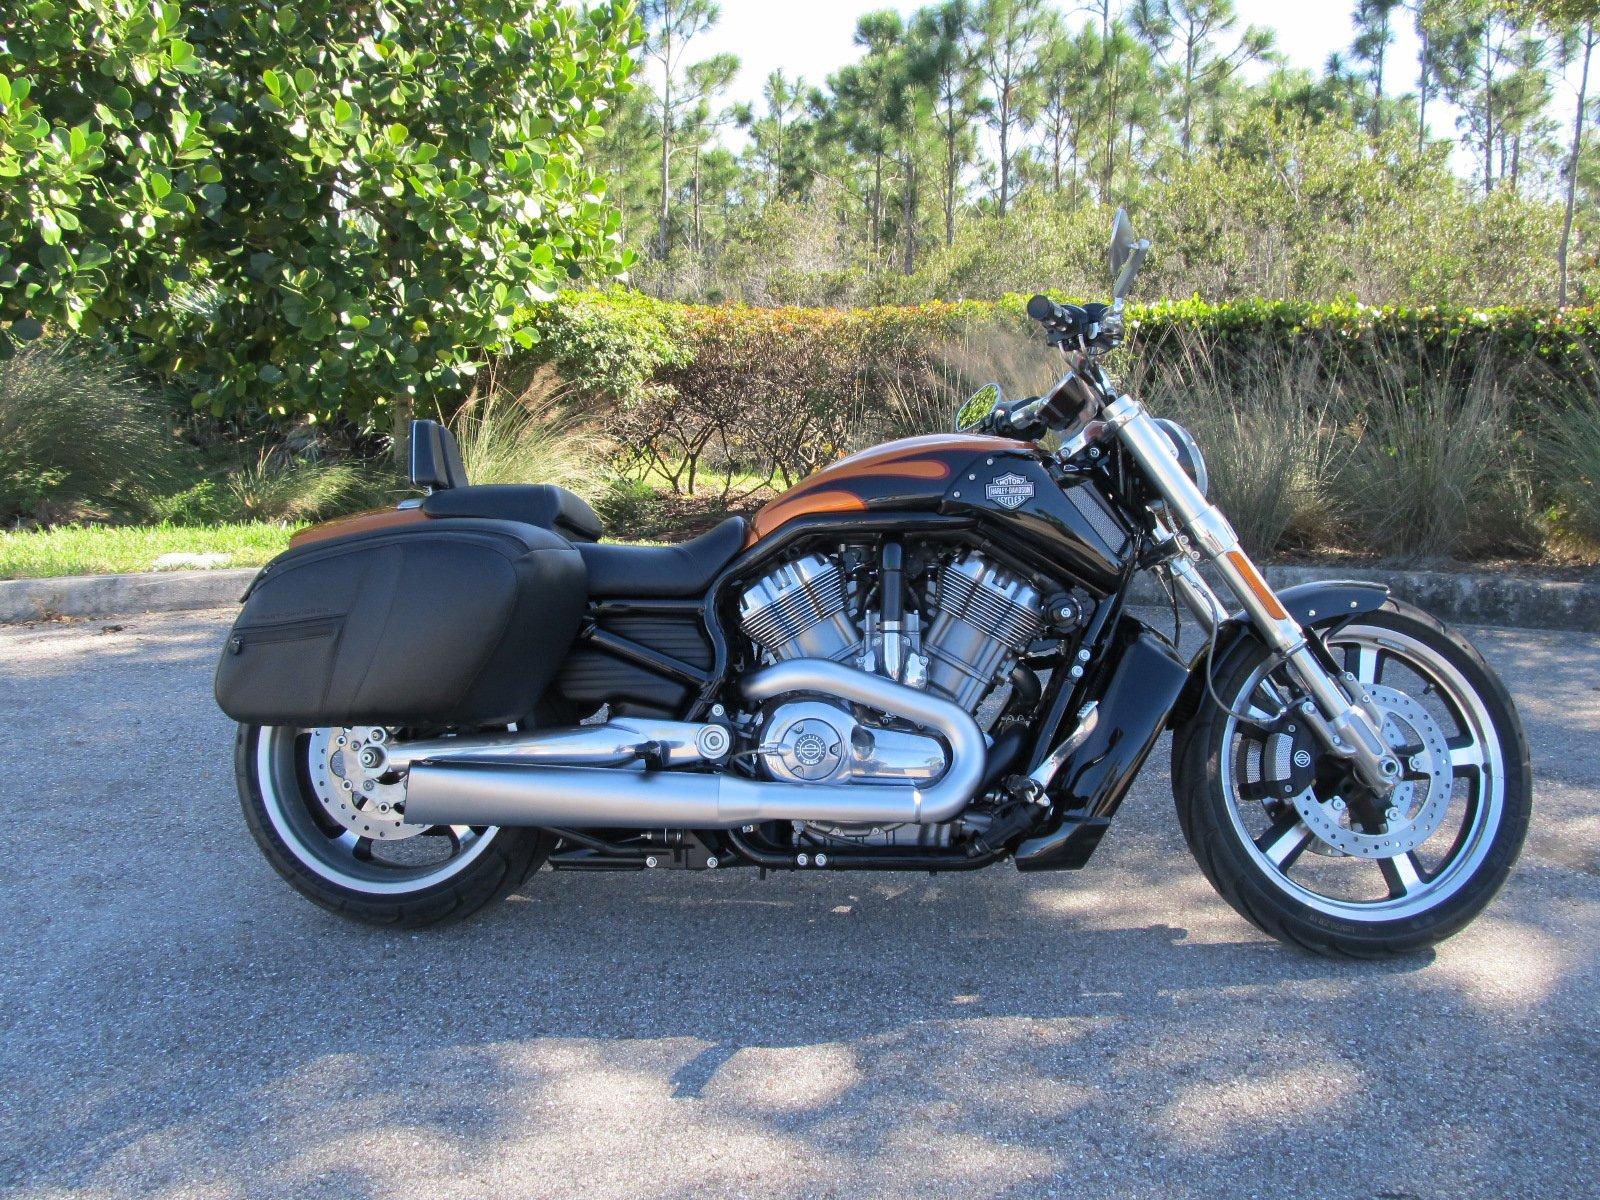 Pre-Owned 2014 Harley-Davidson V-Rod Street Rod VRSCR